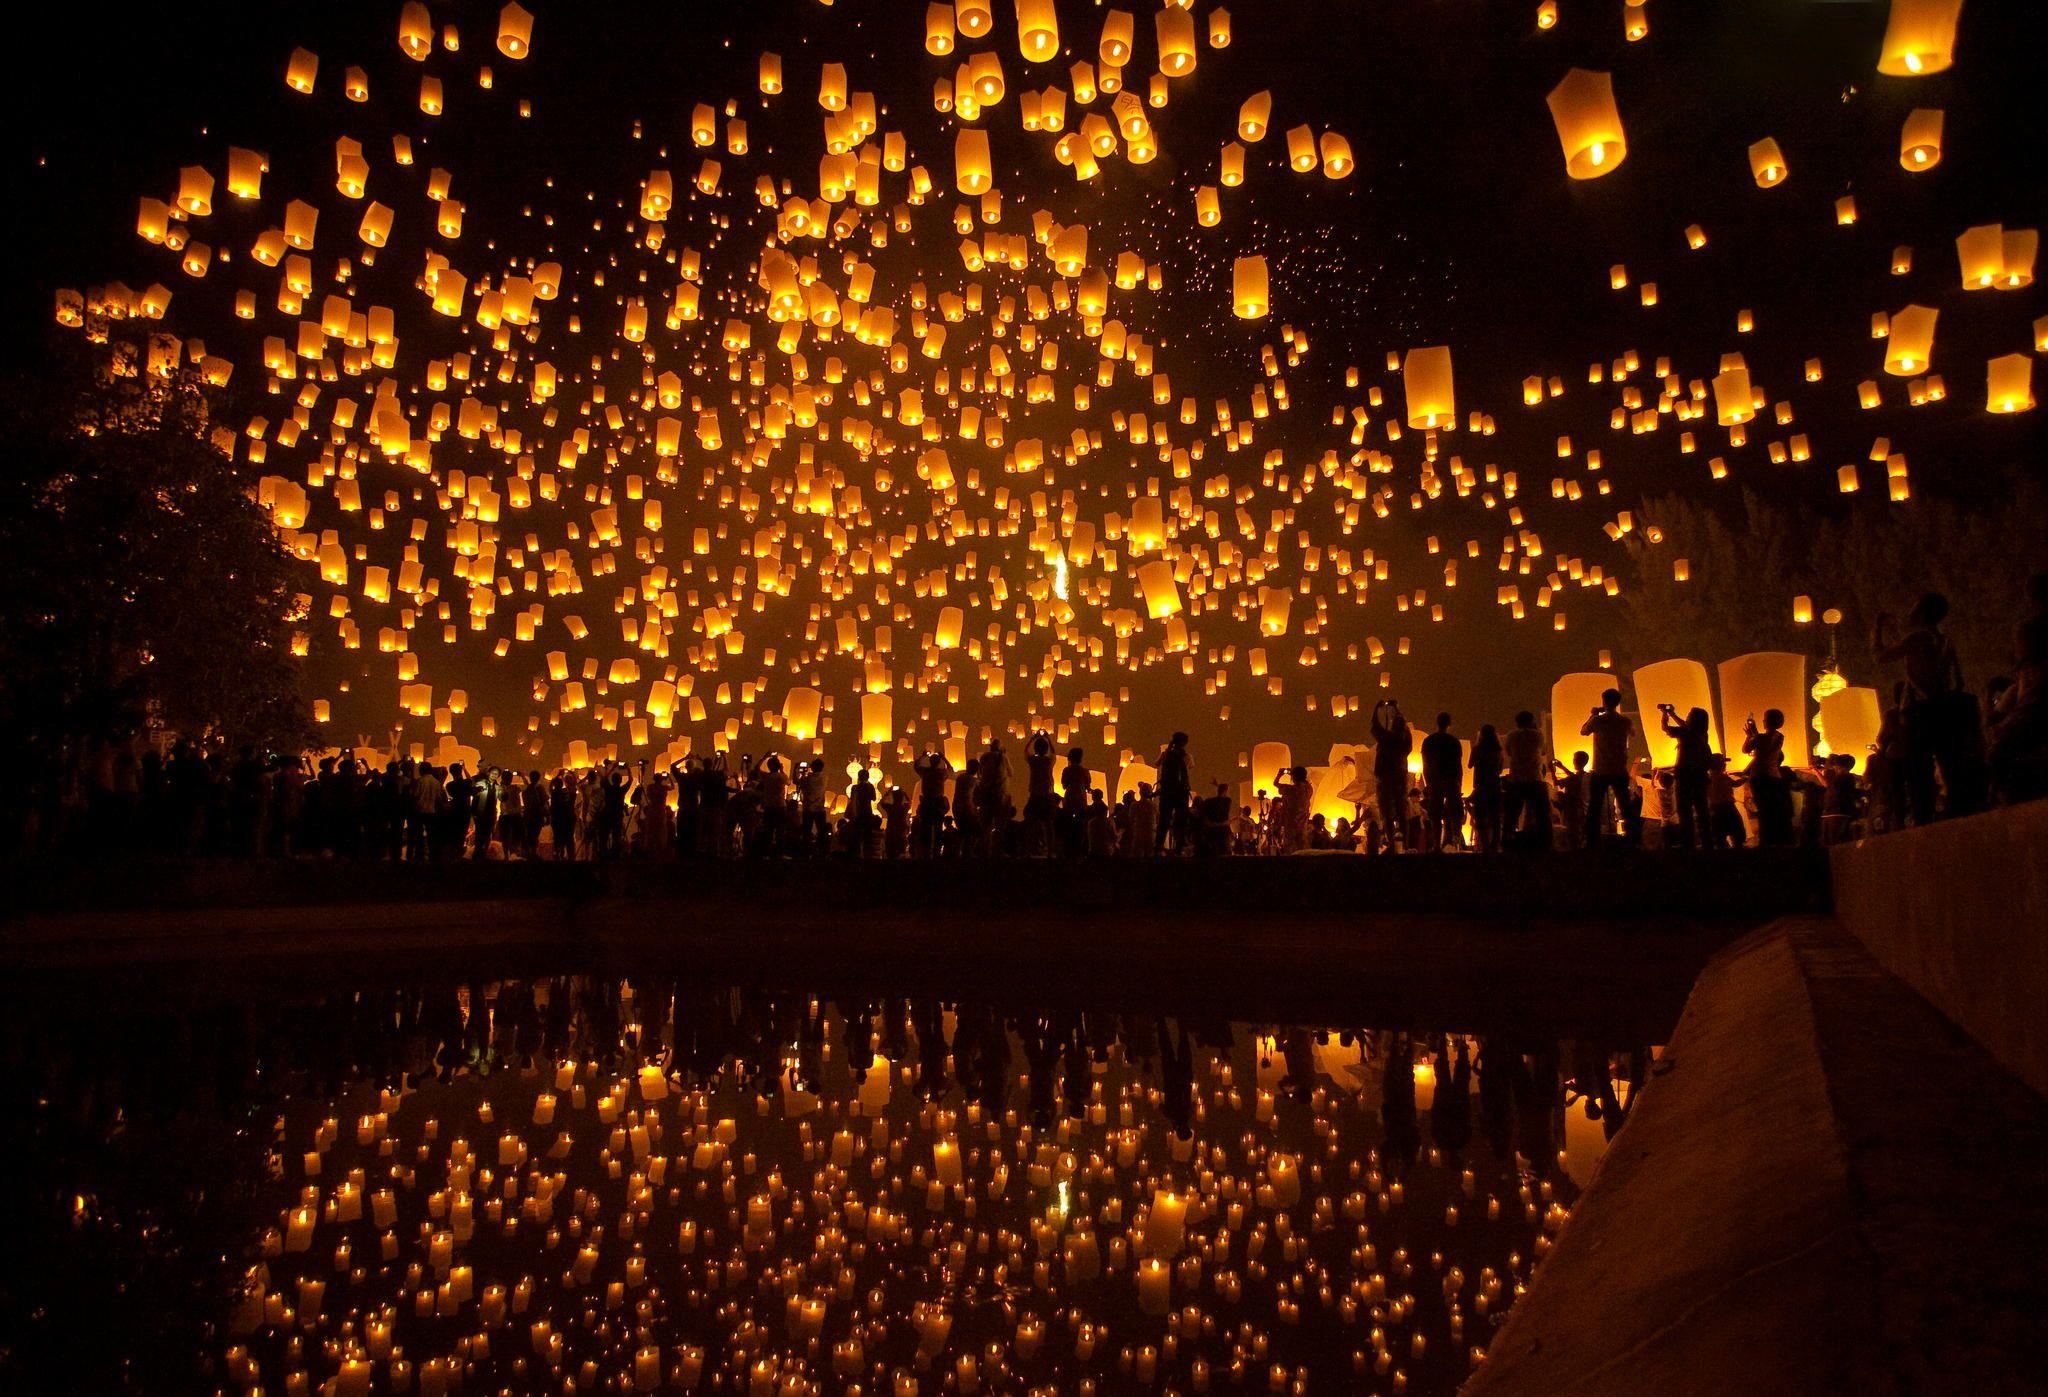 Tangled | Eye Candy | Pinterest | Grand rapids michigan, Chiang ... for Lantern Festival Tangled  45jwn